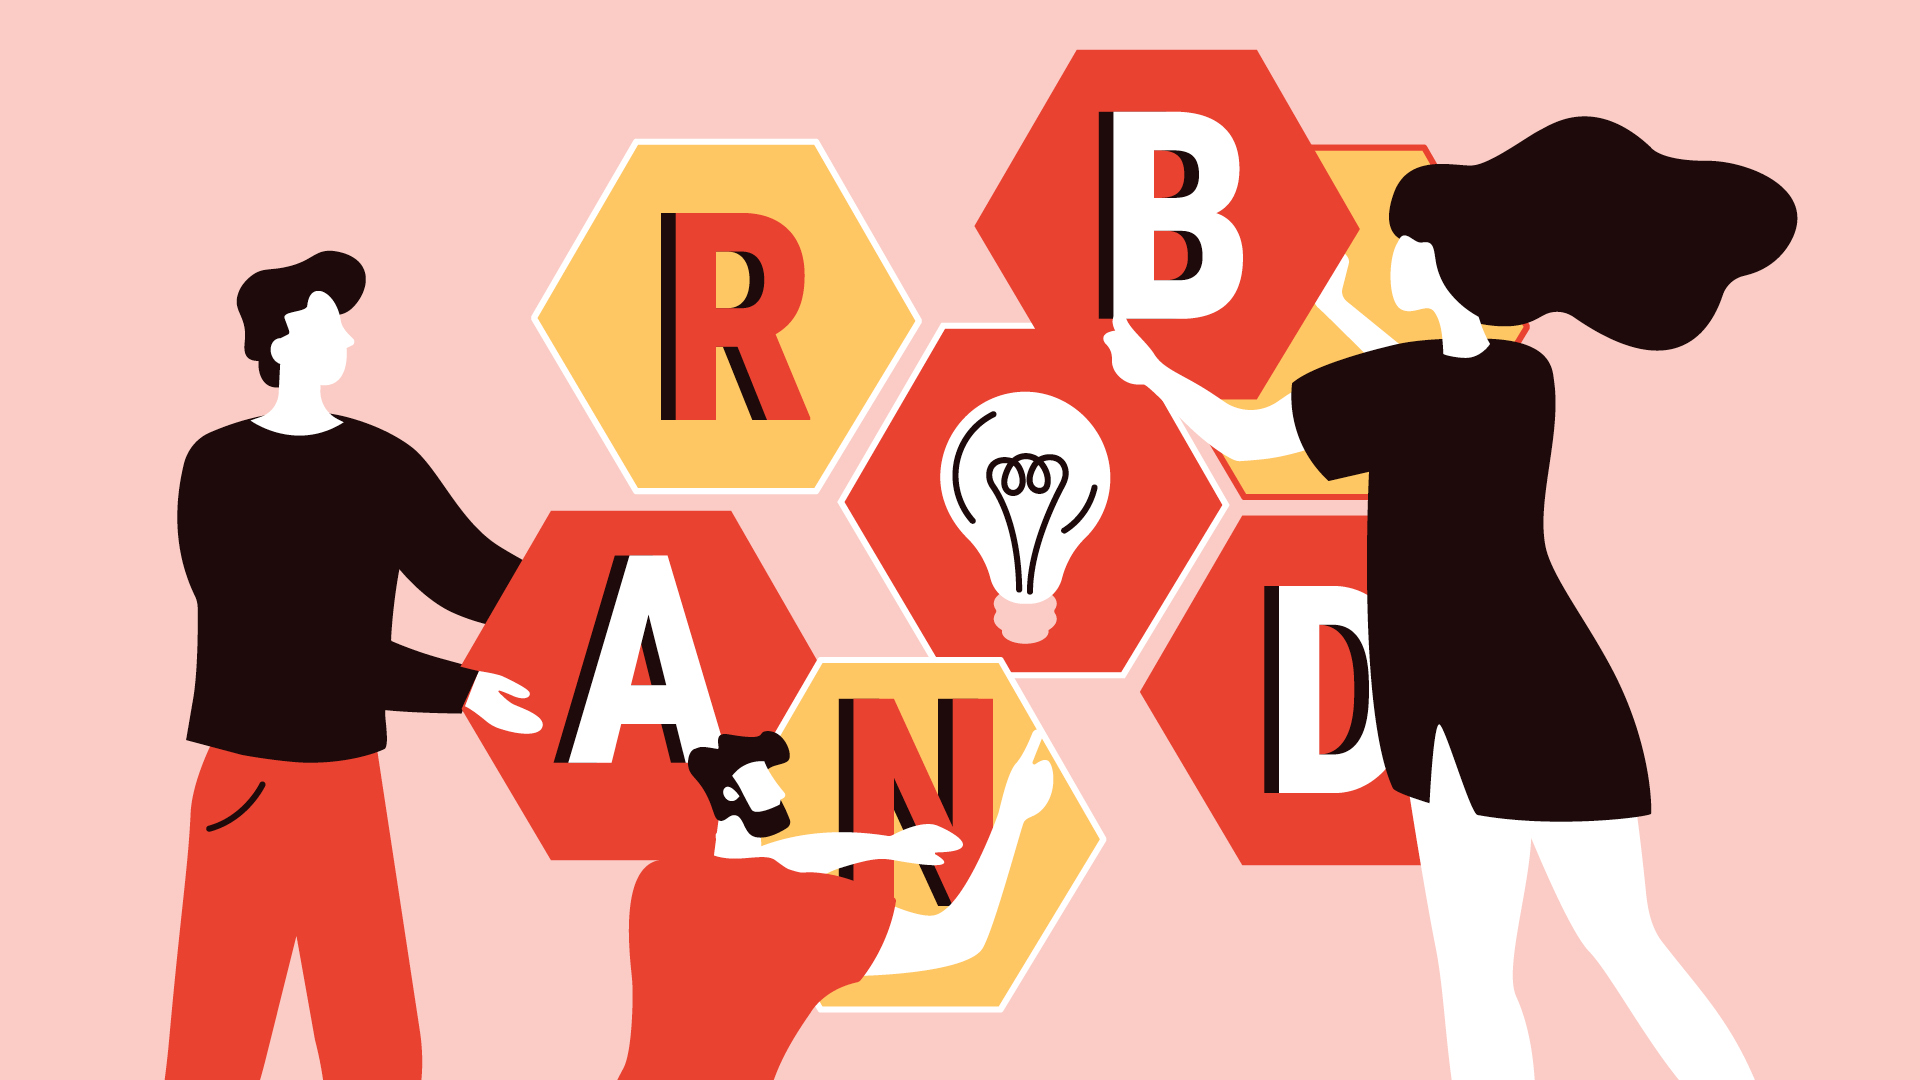 Why start-ups need a brand workshop